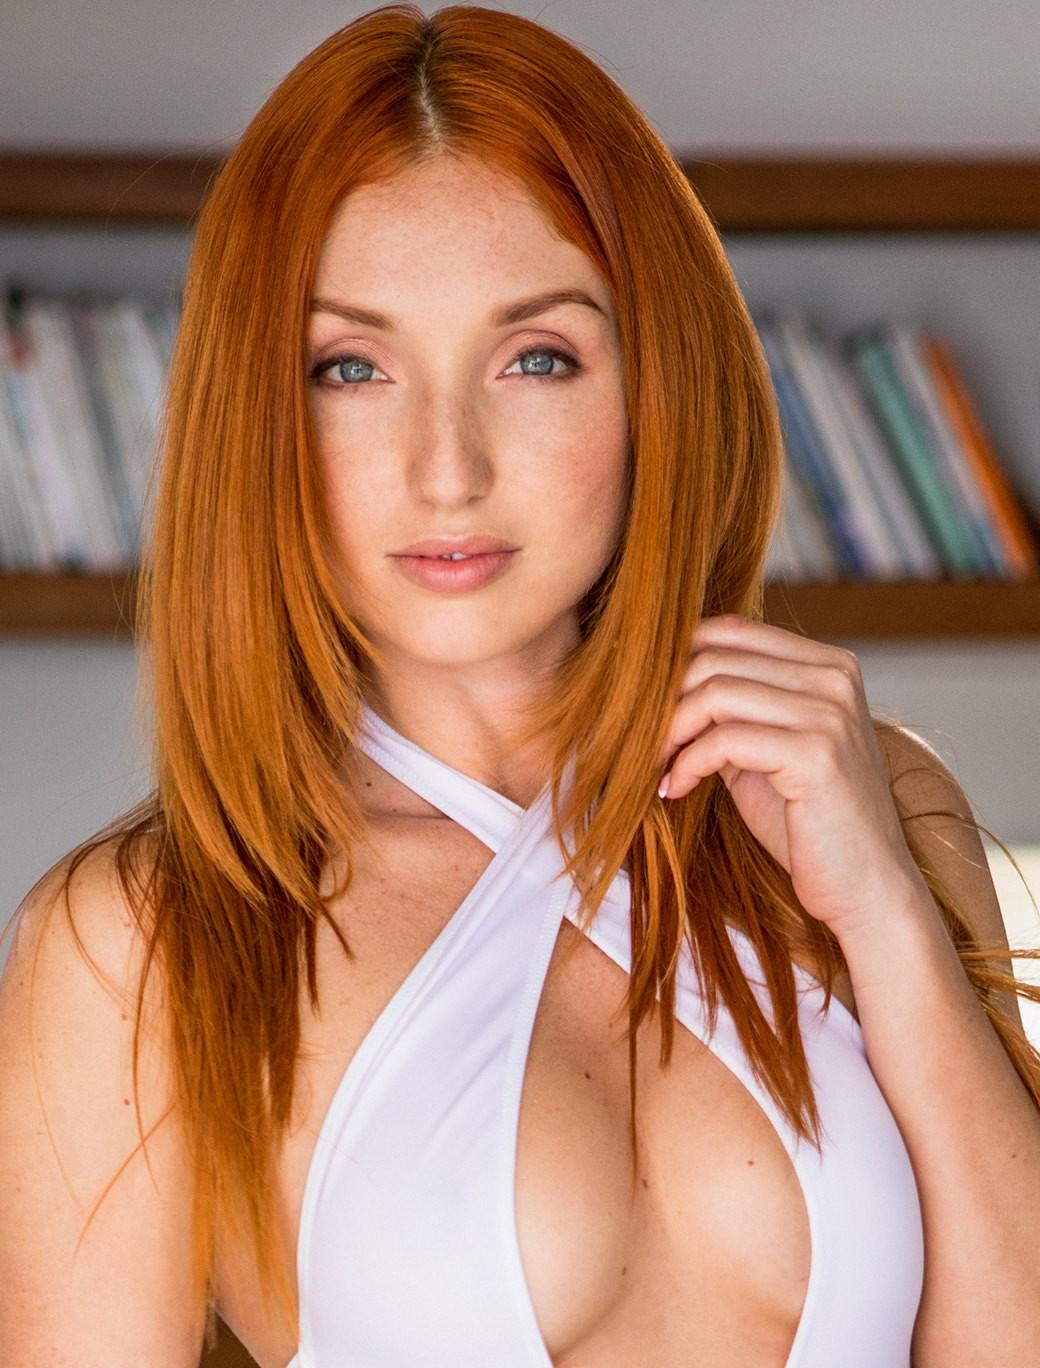 Vixen redhead pornstar, anal vids powered by vbulletin